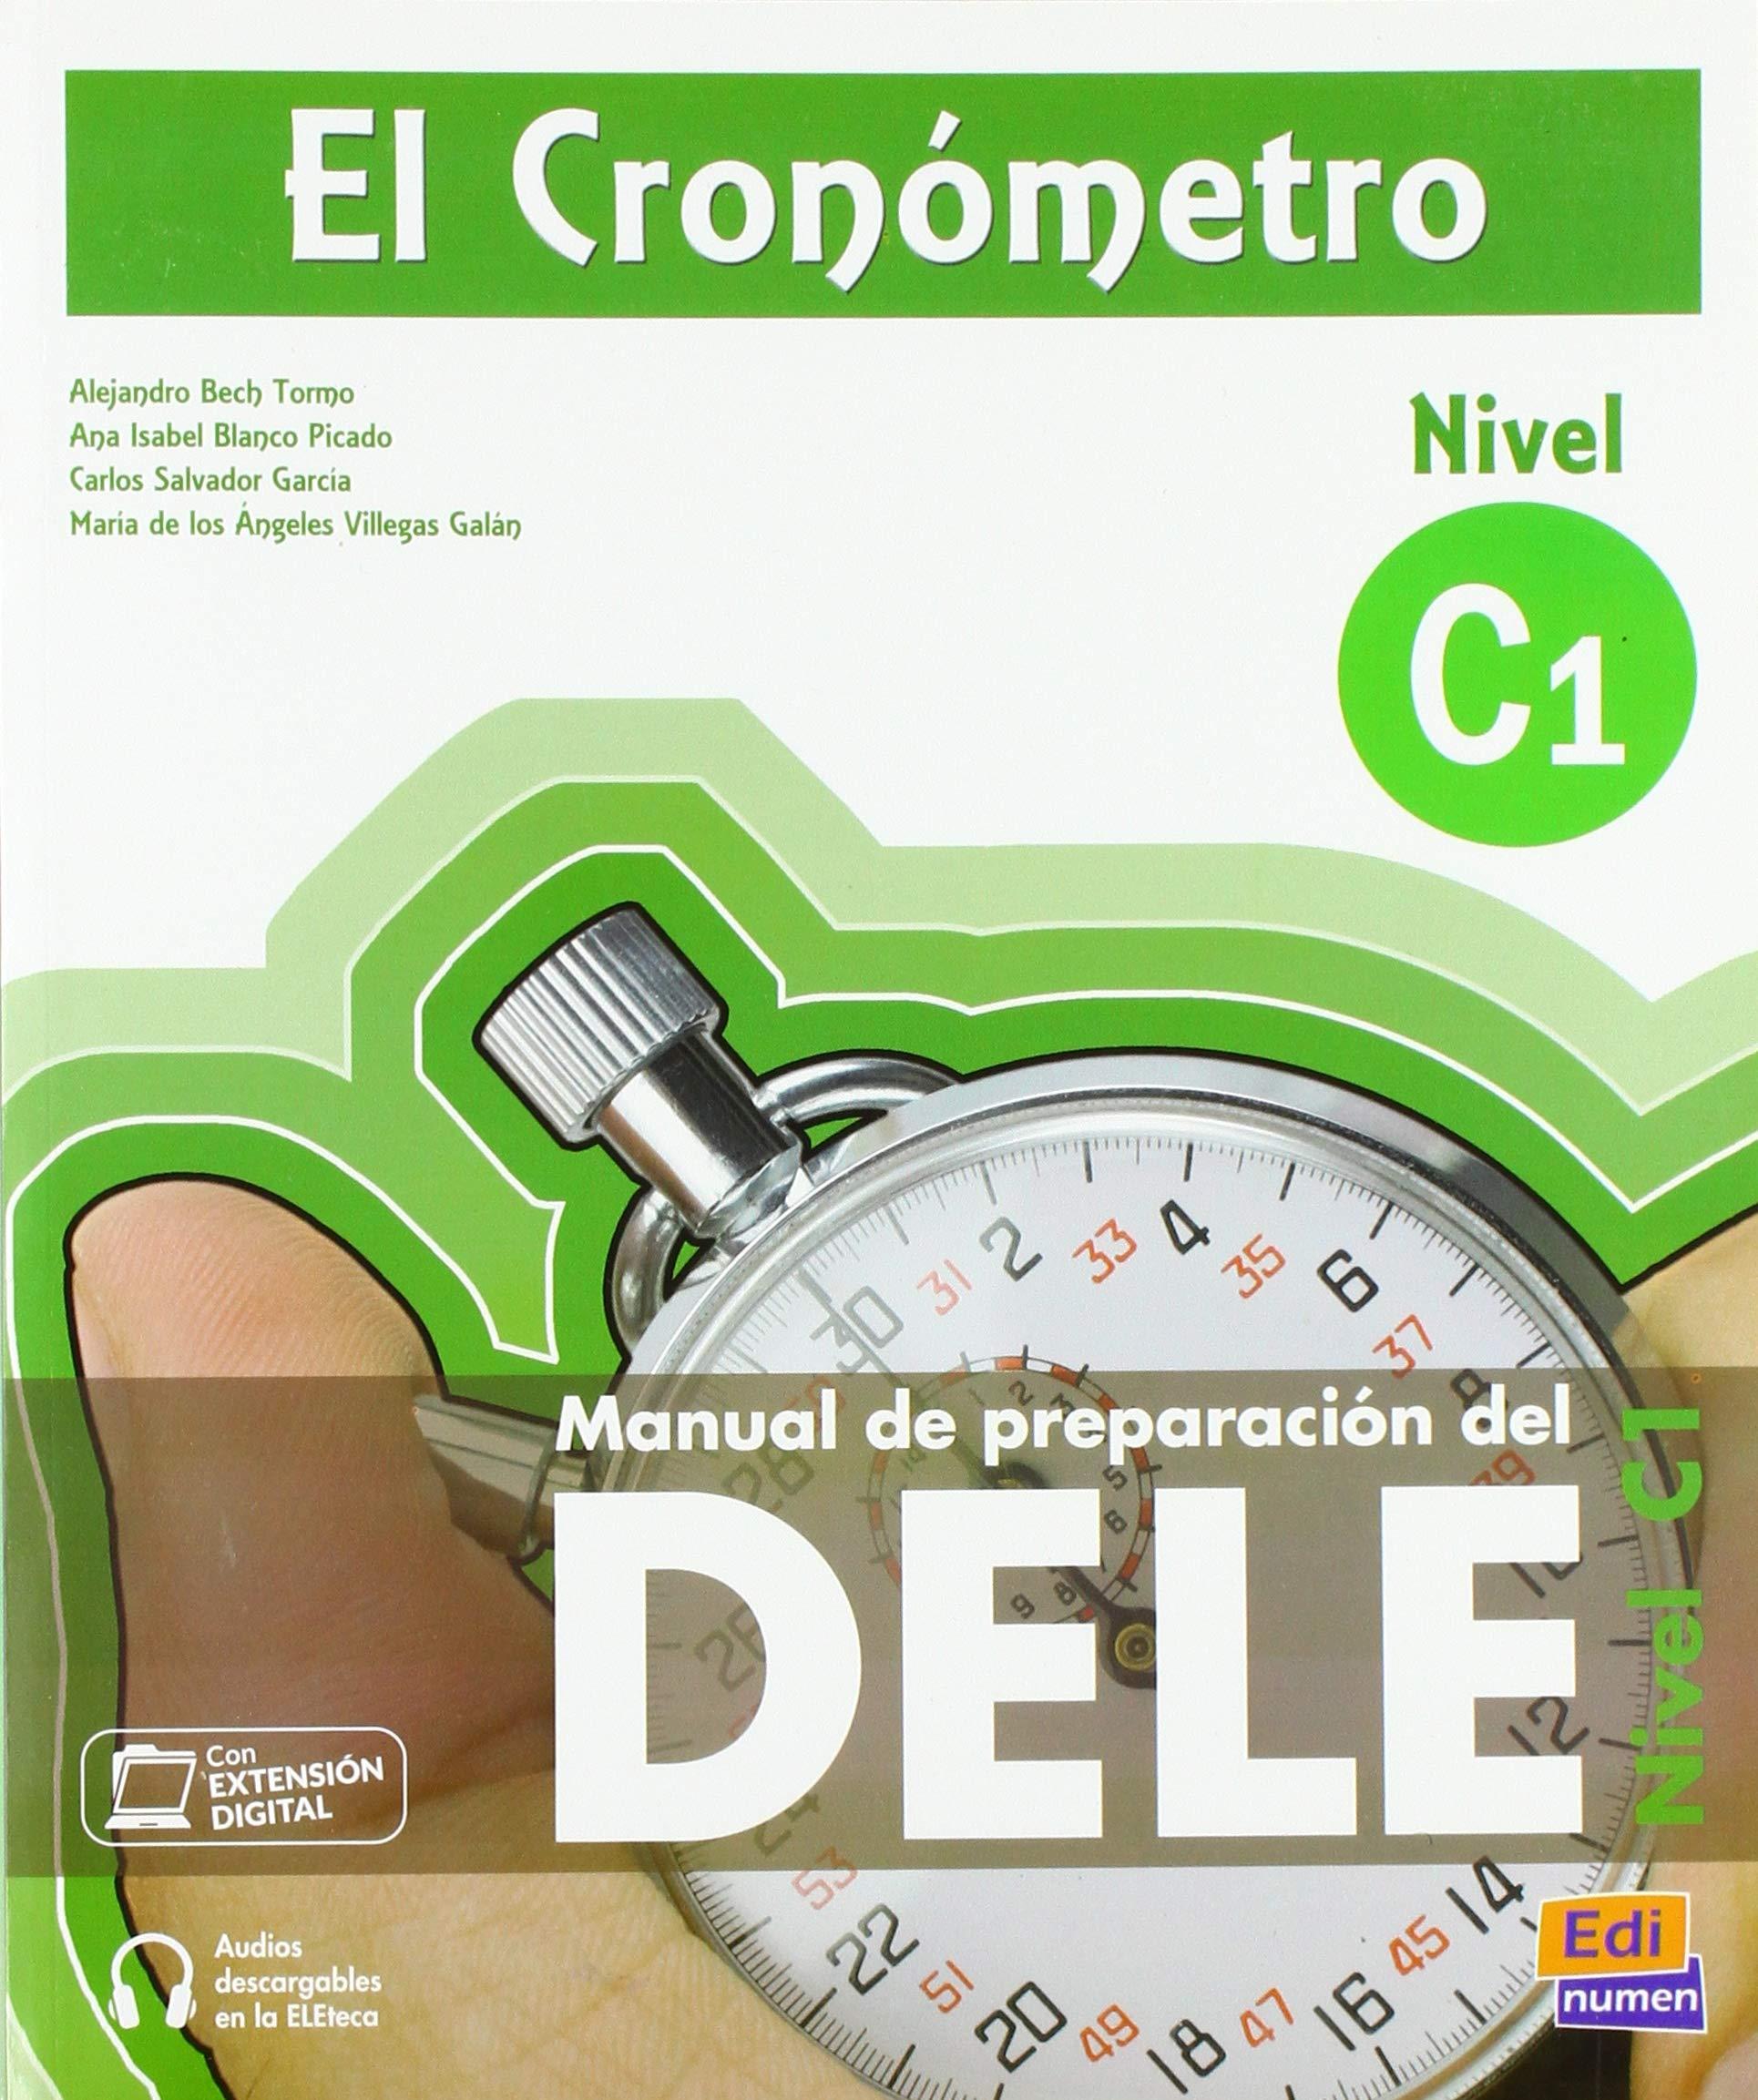 El Cronometro C1 The Timer Manual De Preparacion Del Dele Student S Book For The Dele Preparation Level C1 Blanco Picado Ana Isabel Tarrés Chamorro Iñaki Villegas Gabin María